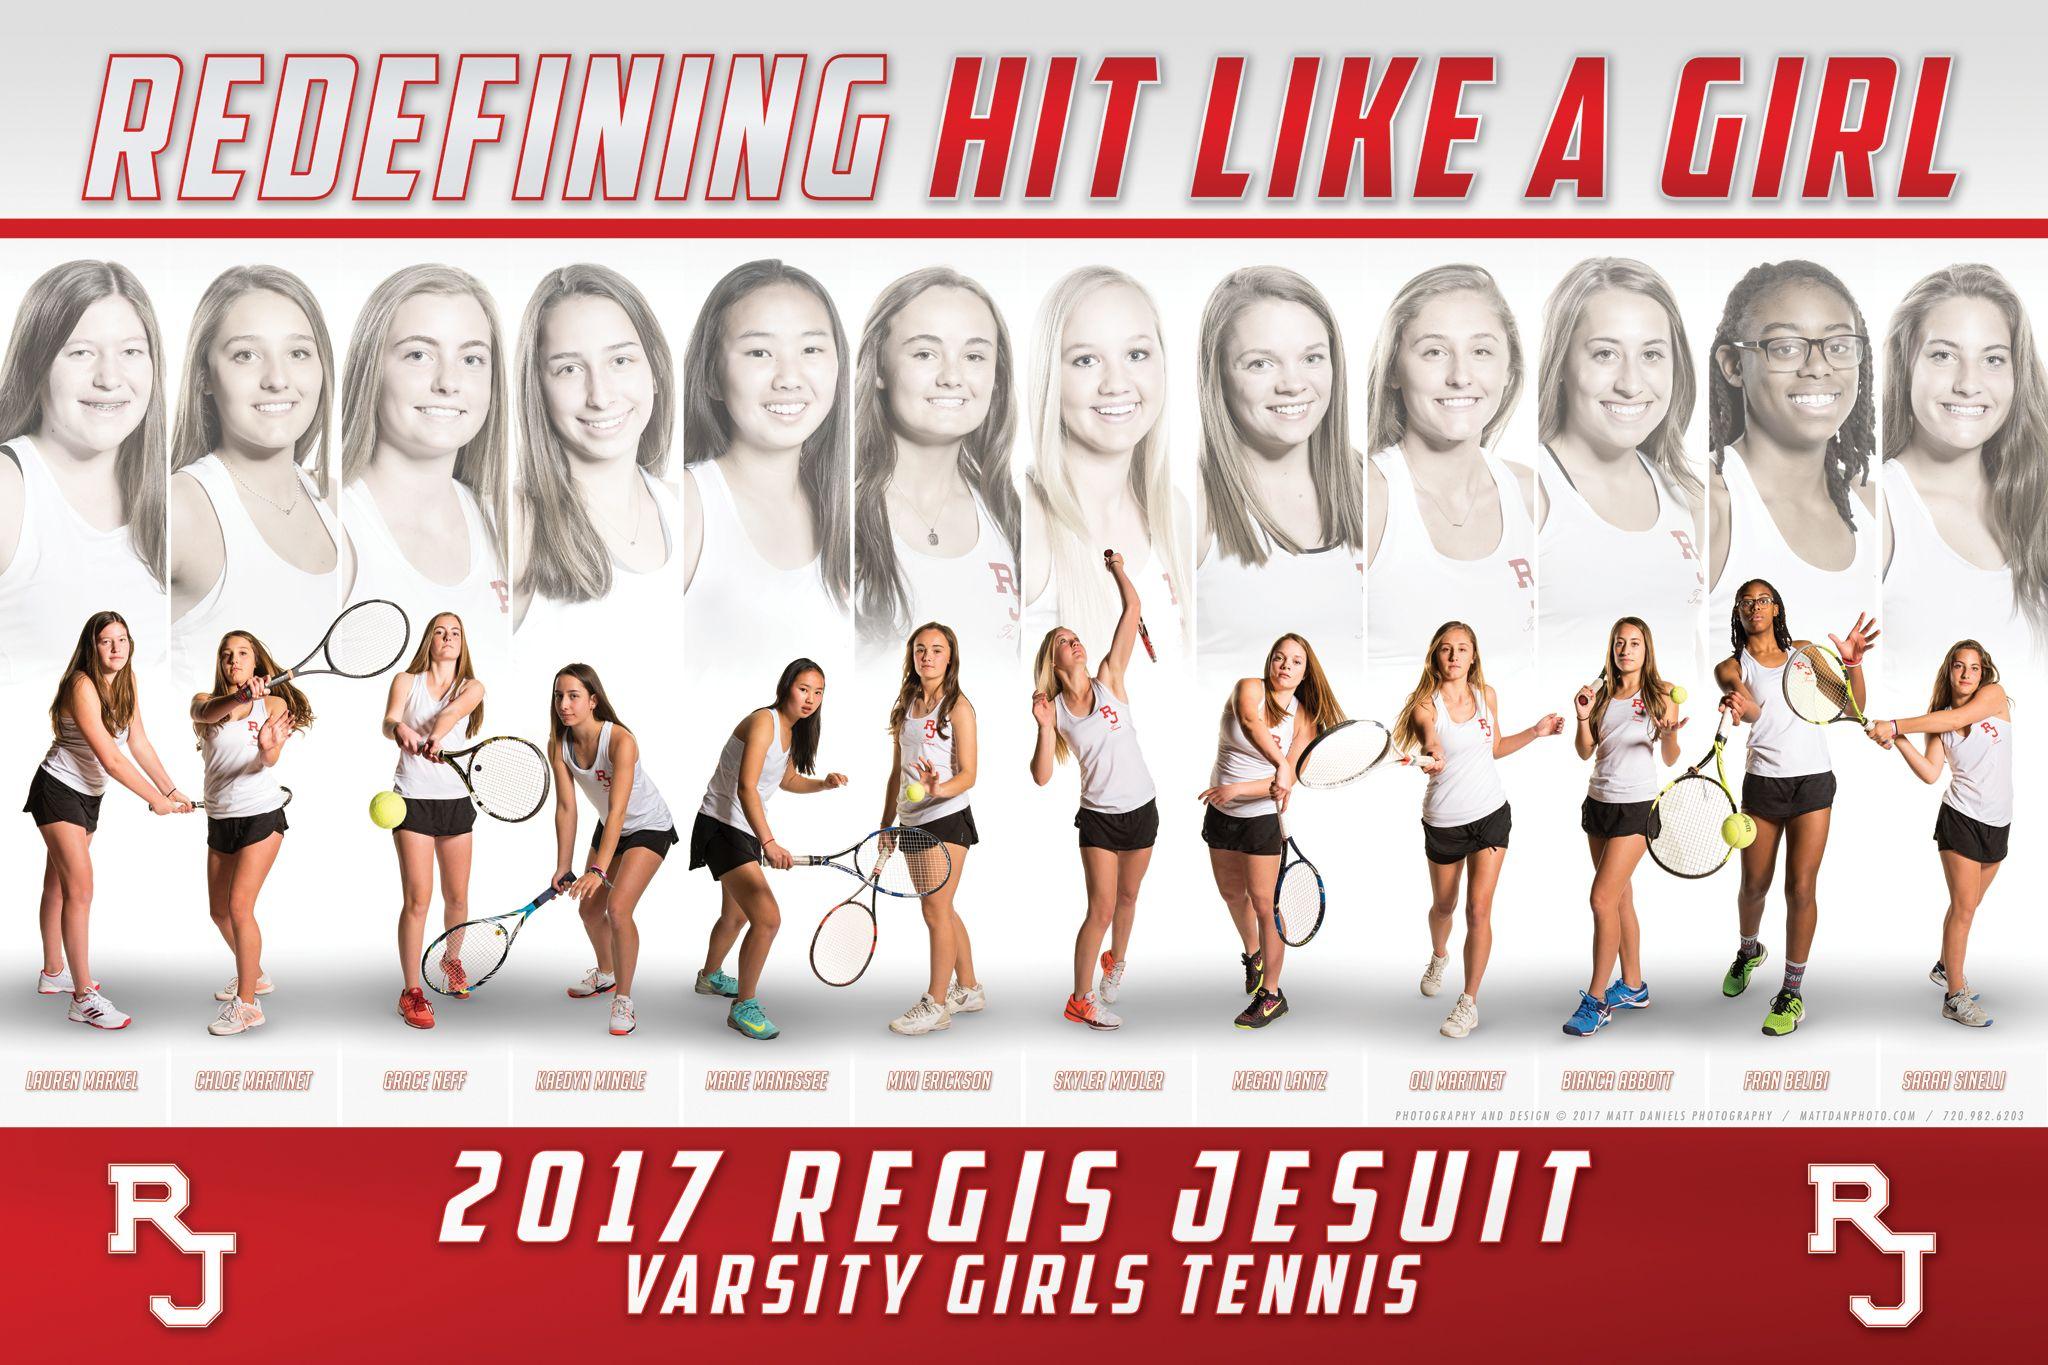 Photography And Poster Design For The 2017 Regis Jesuit Girls Tennis Team Copyright 2017 Matt Daniels Photography Sport Poster Team Photography Poster